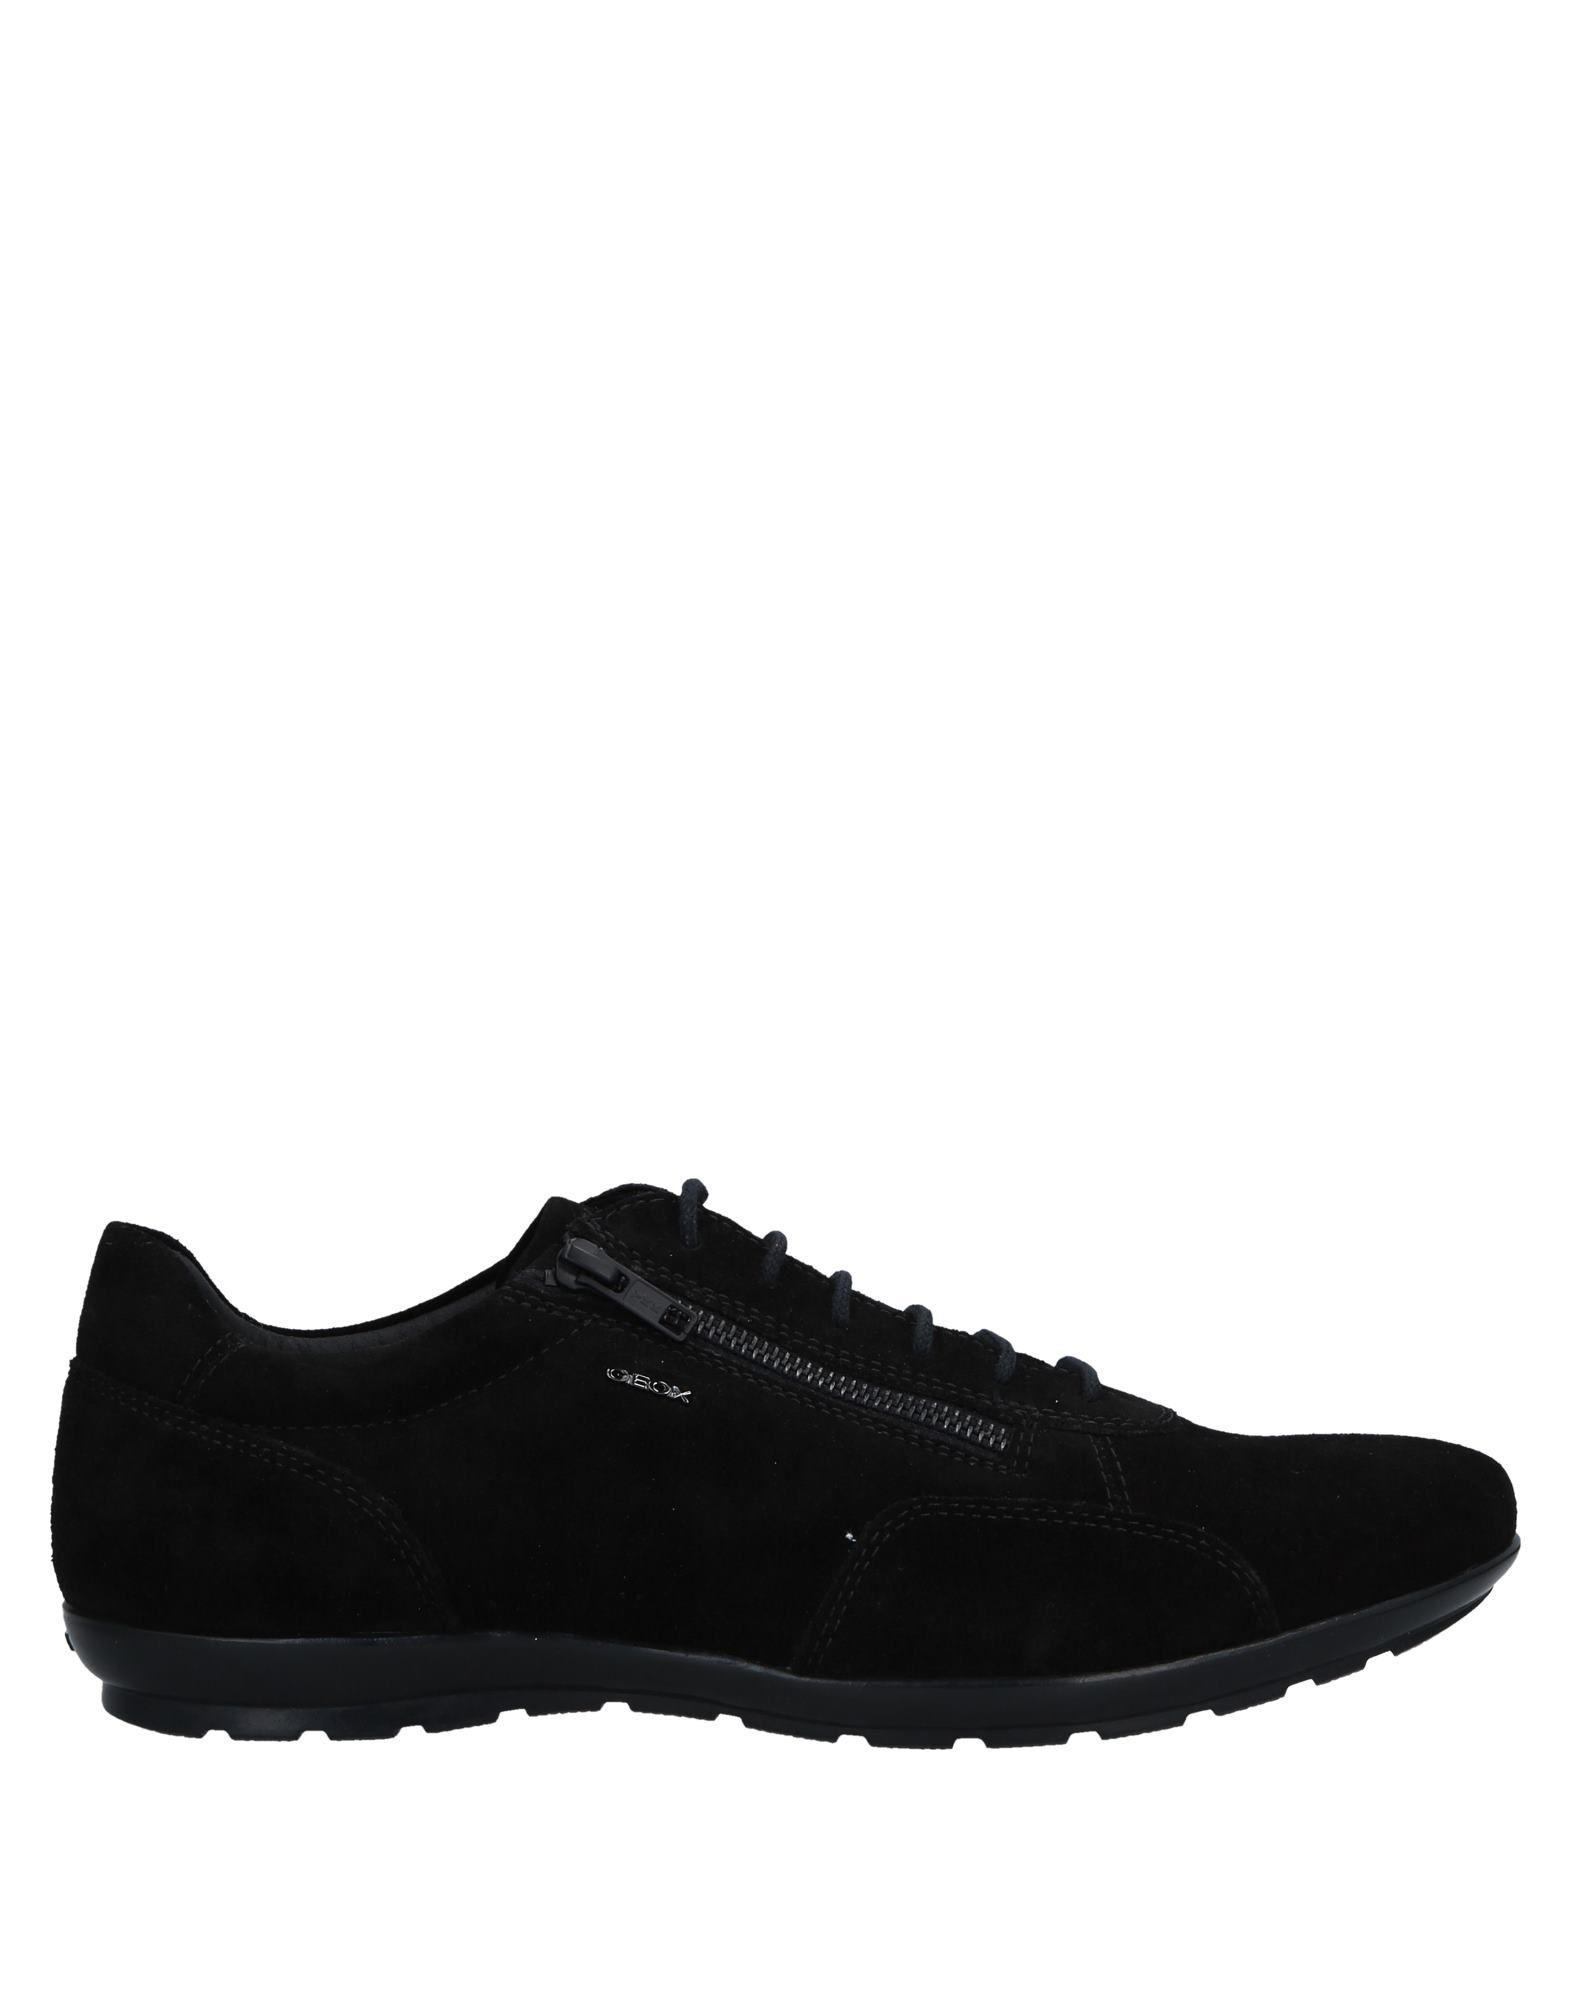 Sneakers Geox Homme - Sneakers Geox  Moka Dernières chaussures discount pour hommes et femmes